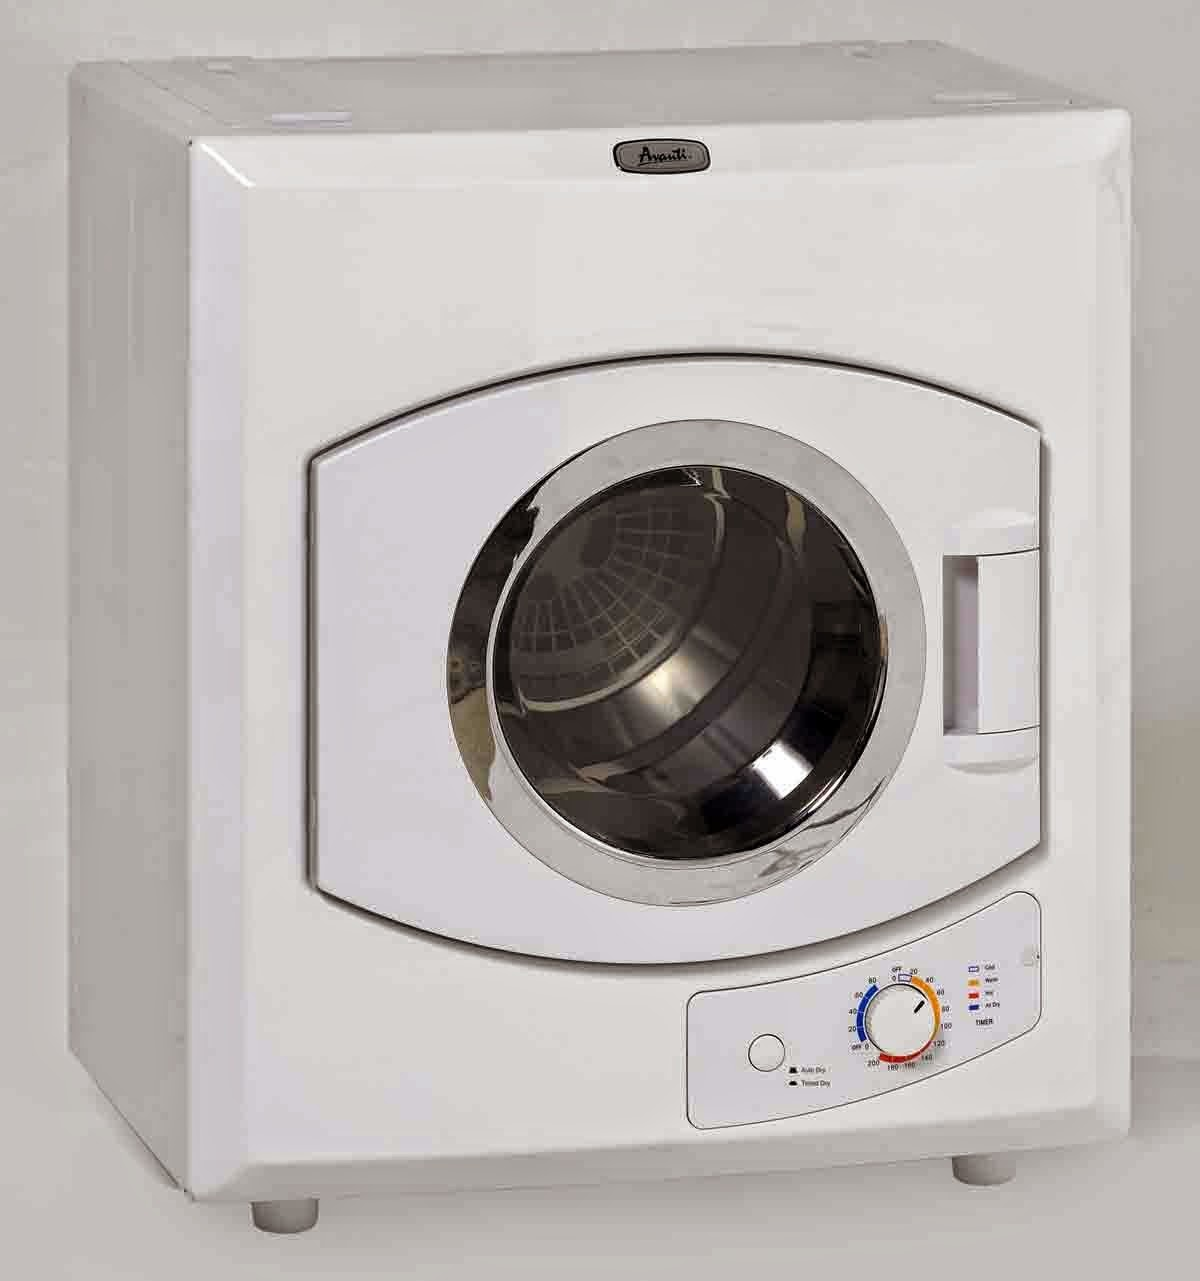 avanti 110volt automatic dryer